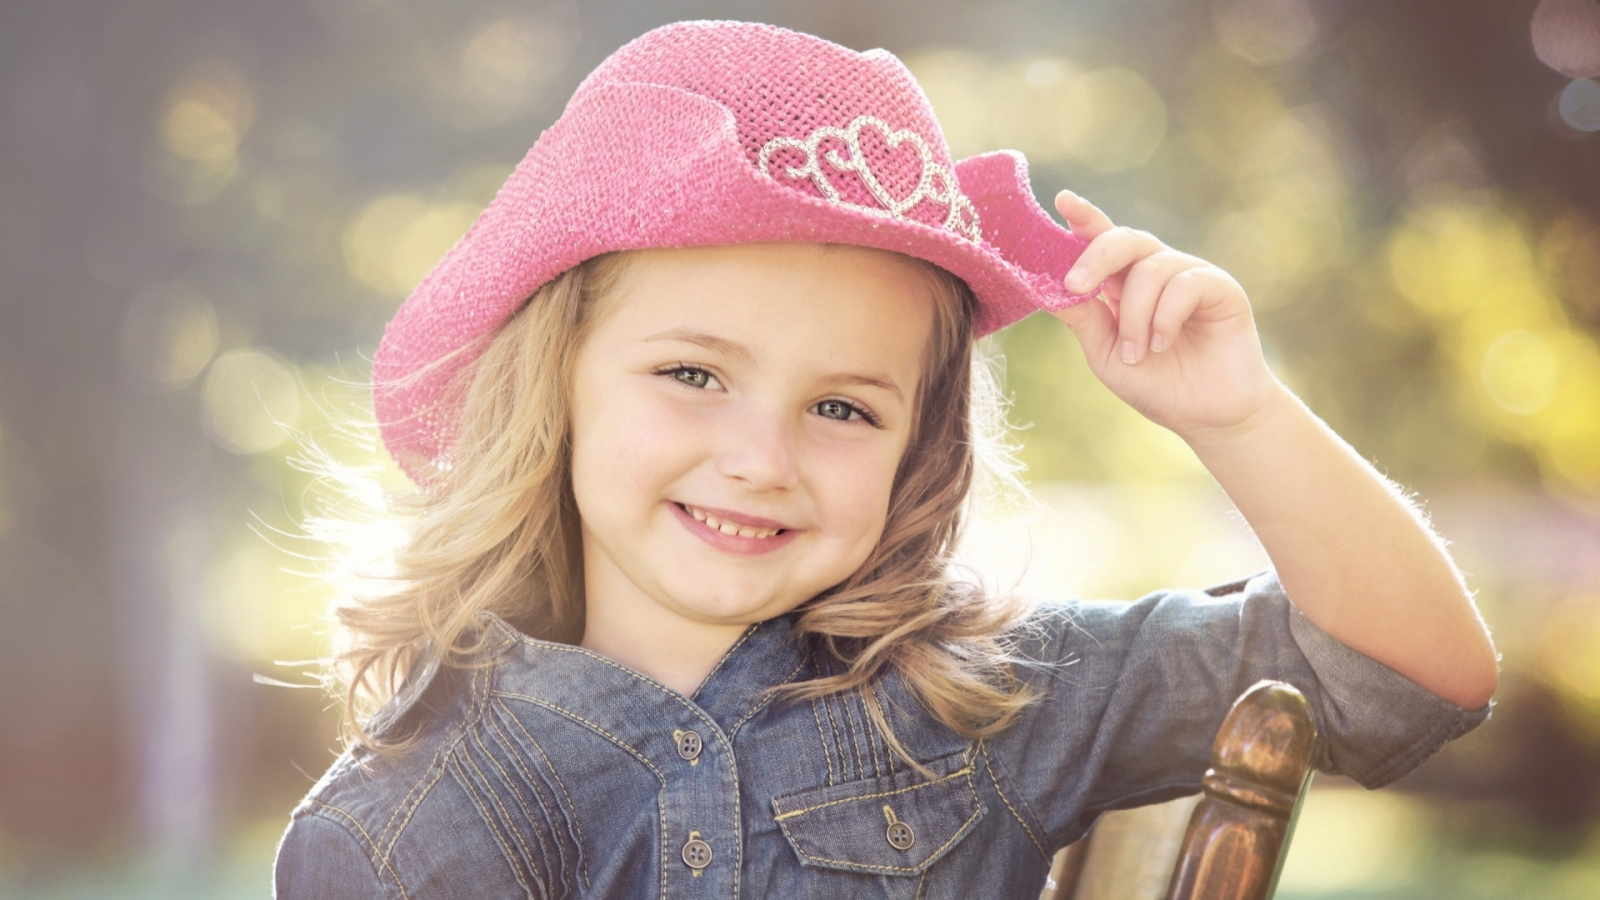 cute baby girls hd wallpapers top background desktop baby girls images 1600x900